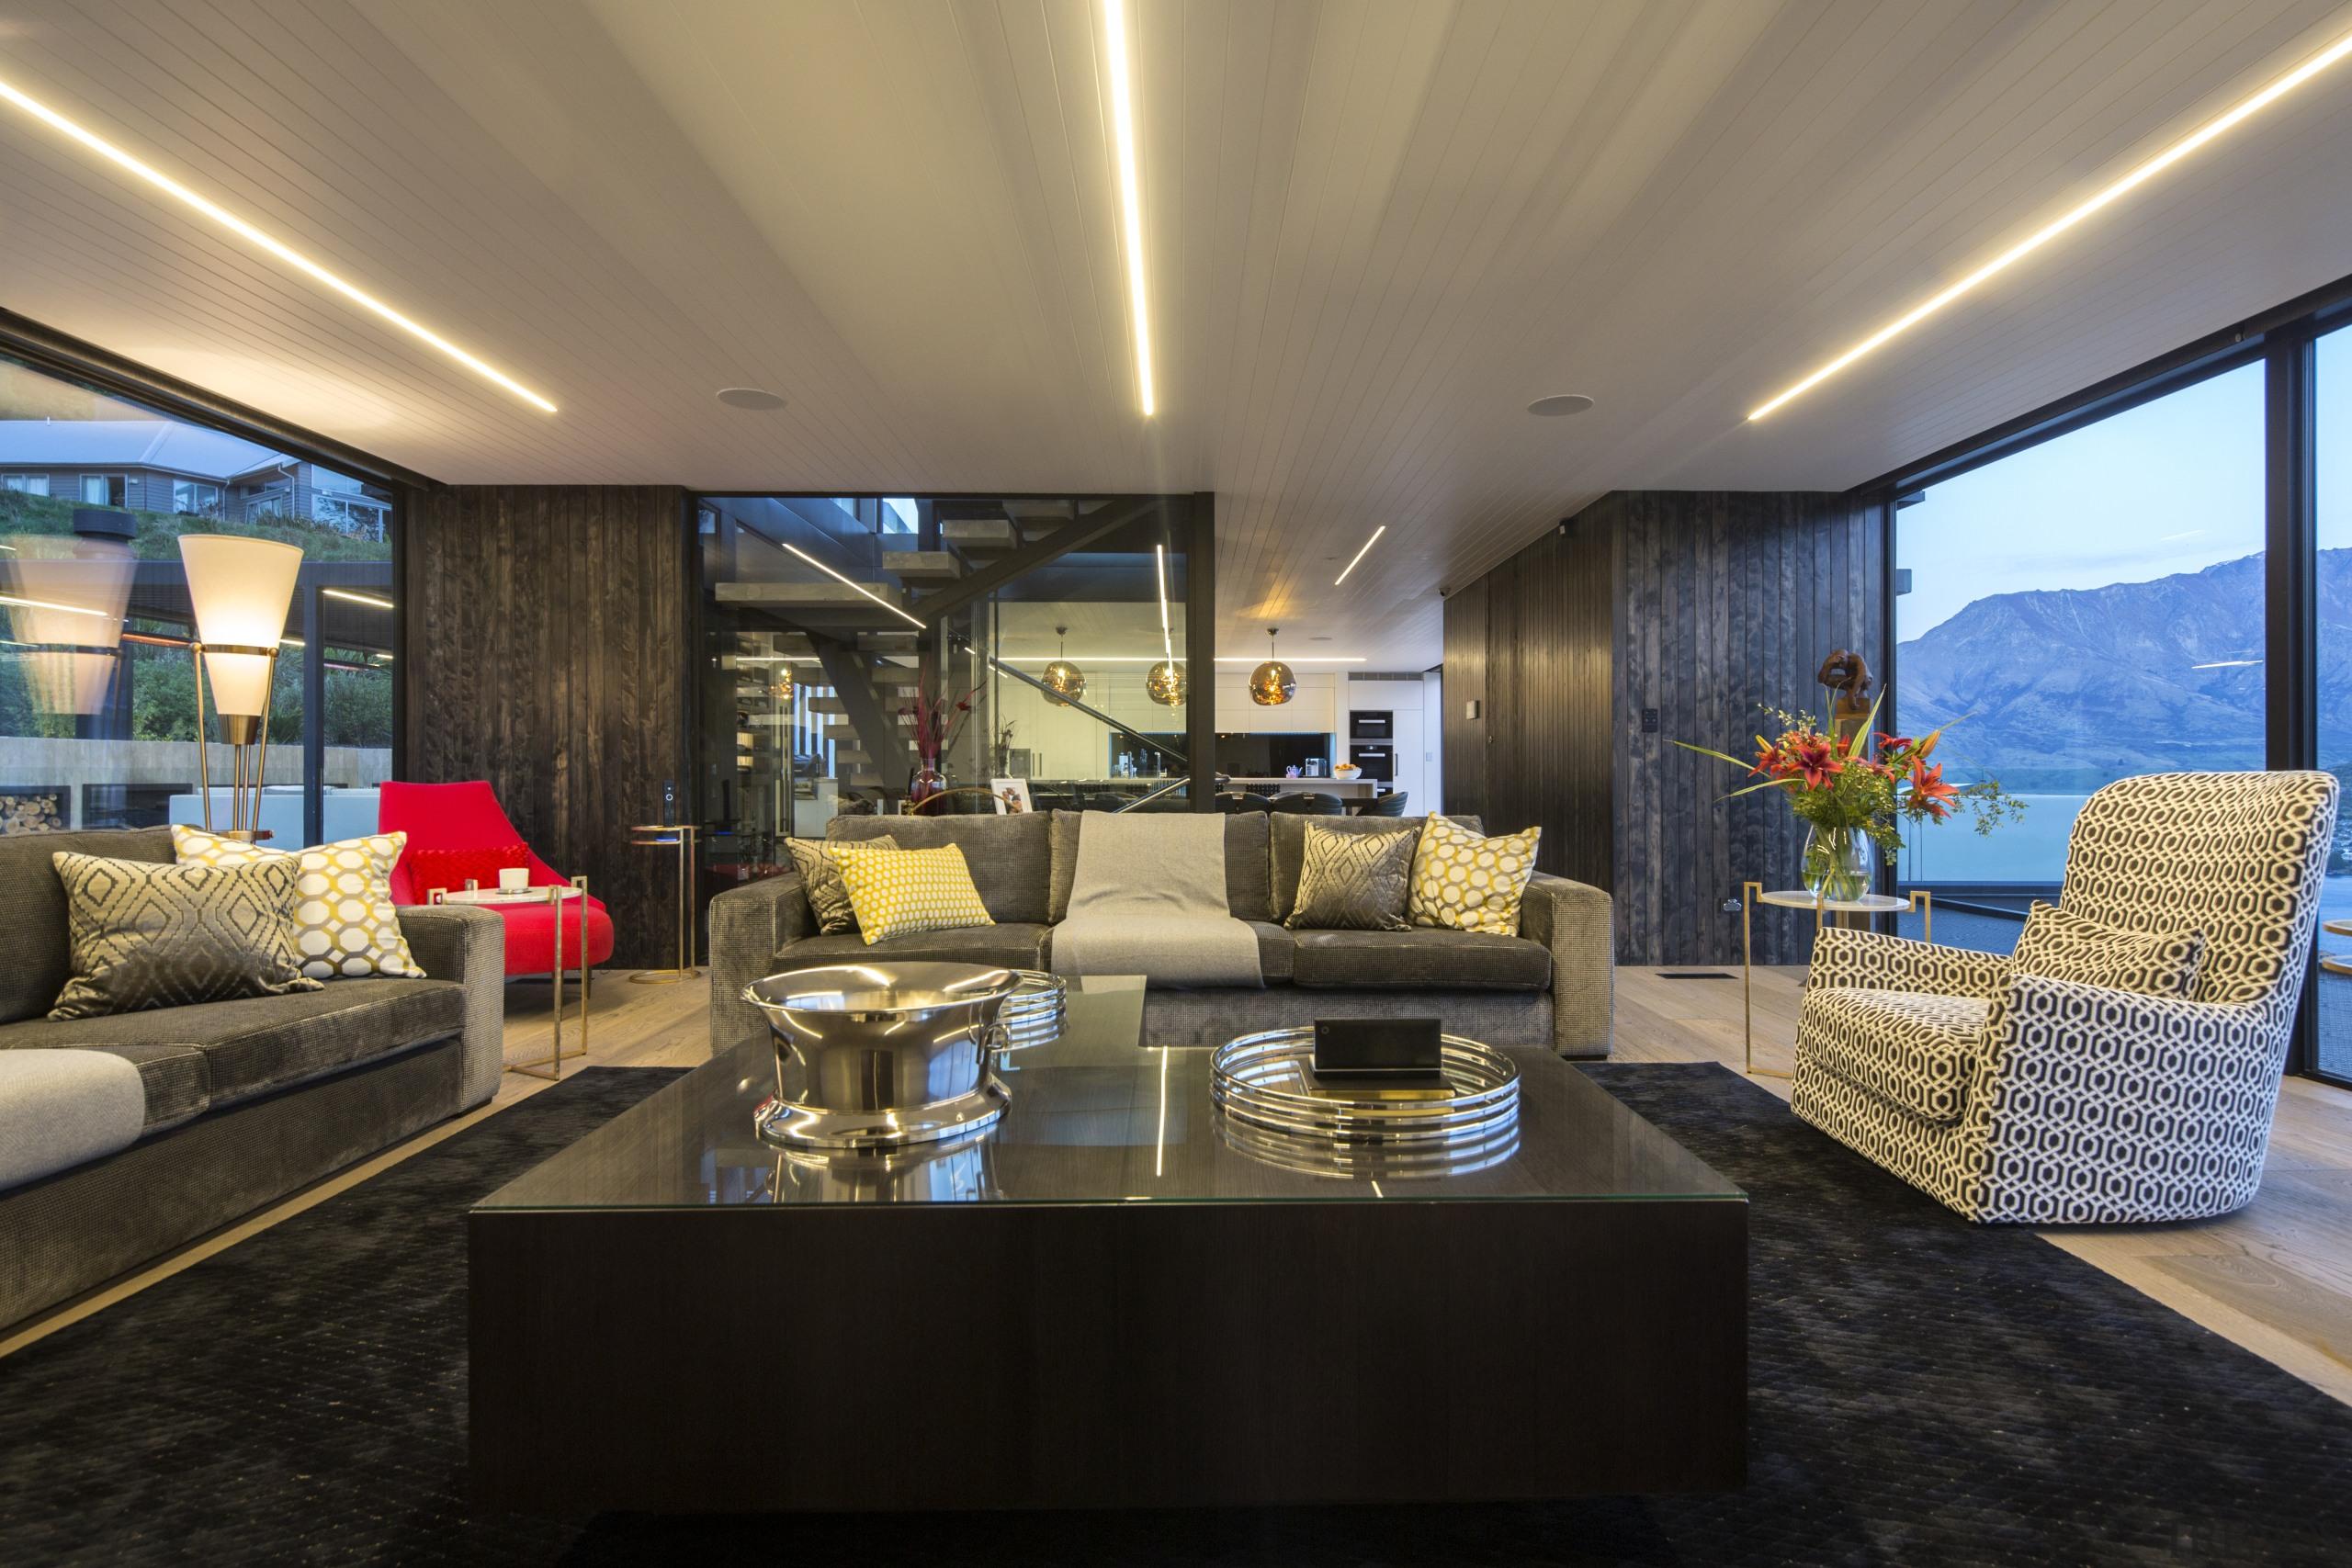 大气、现代的客厅设计,屋顶的线性灯光是亮点。 apartment, architecture, house, interior design, living room, penthouse apartment, real estate, black